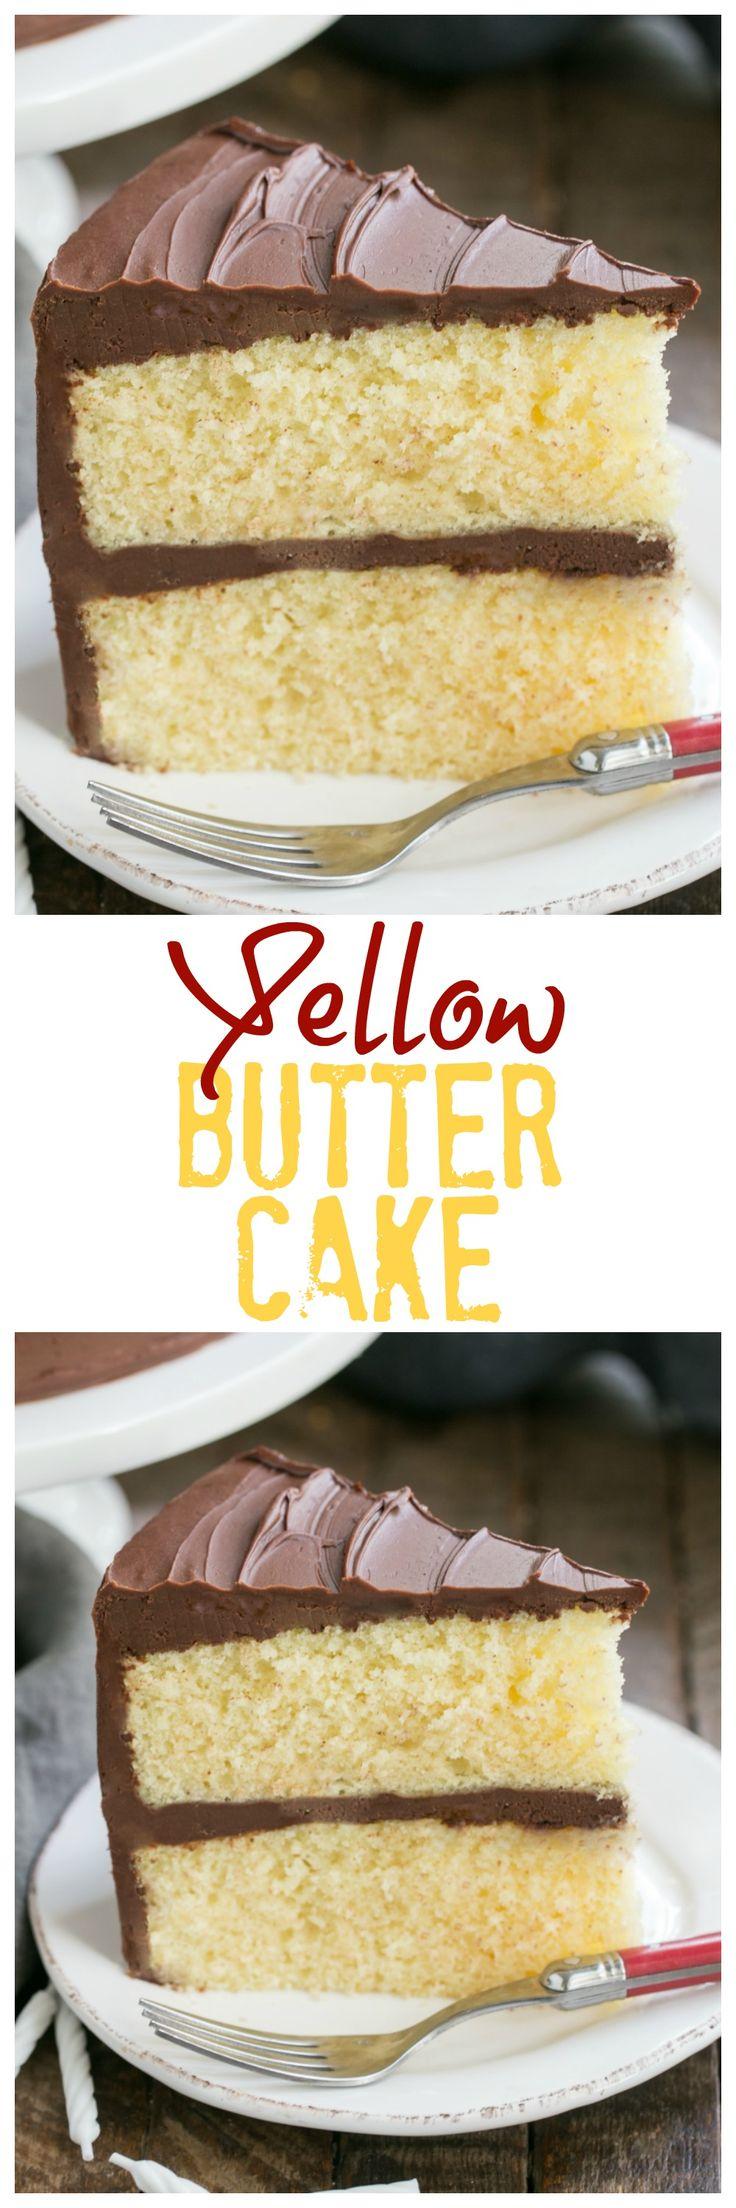 Classic Yellow Butter Cake with Chocolate Icing   Perfect cake for any celebration! #yellowcake #birthdaycake